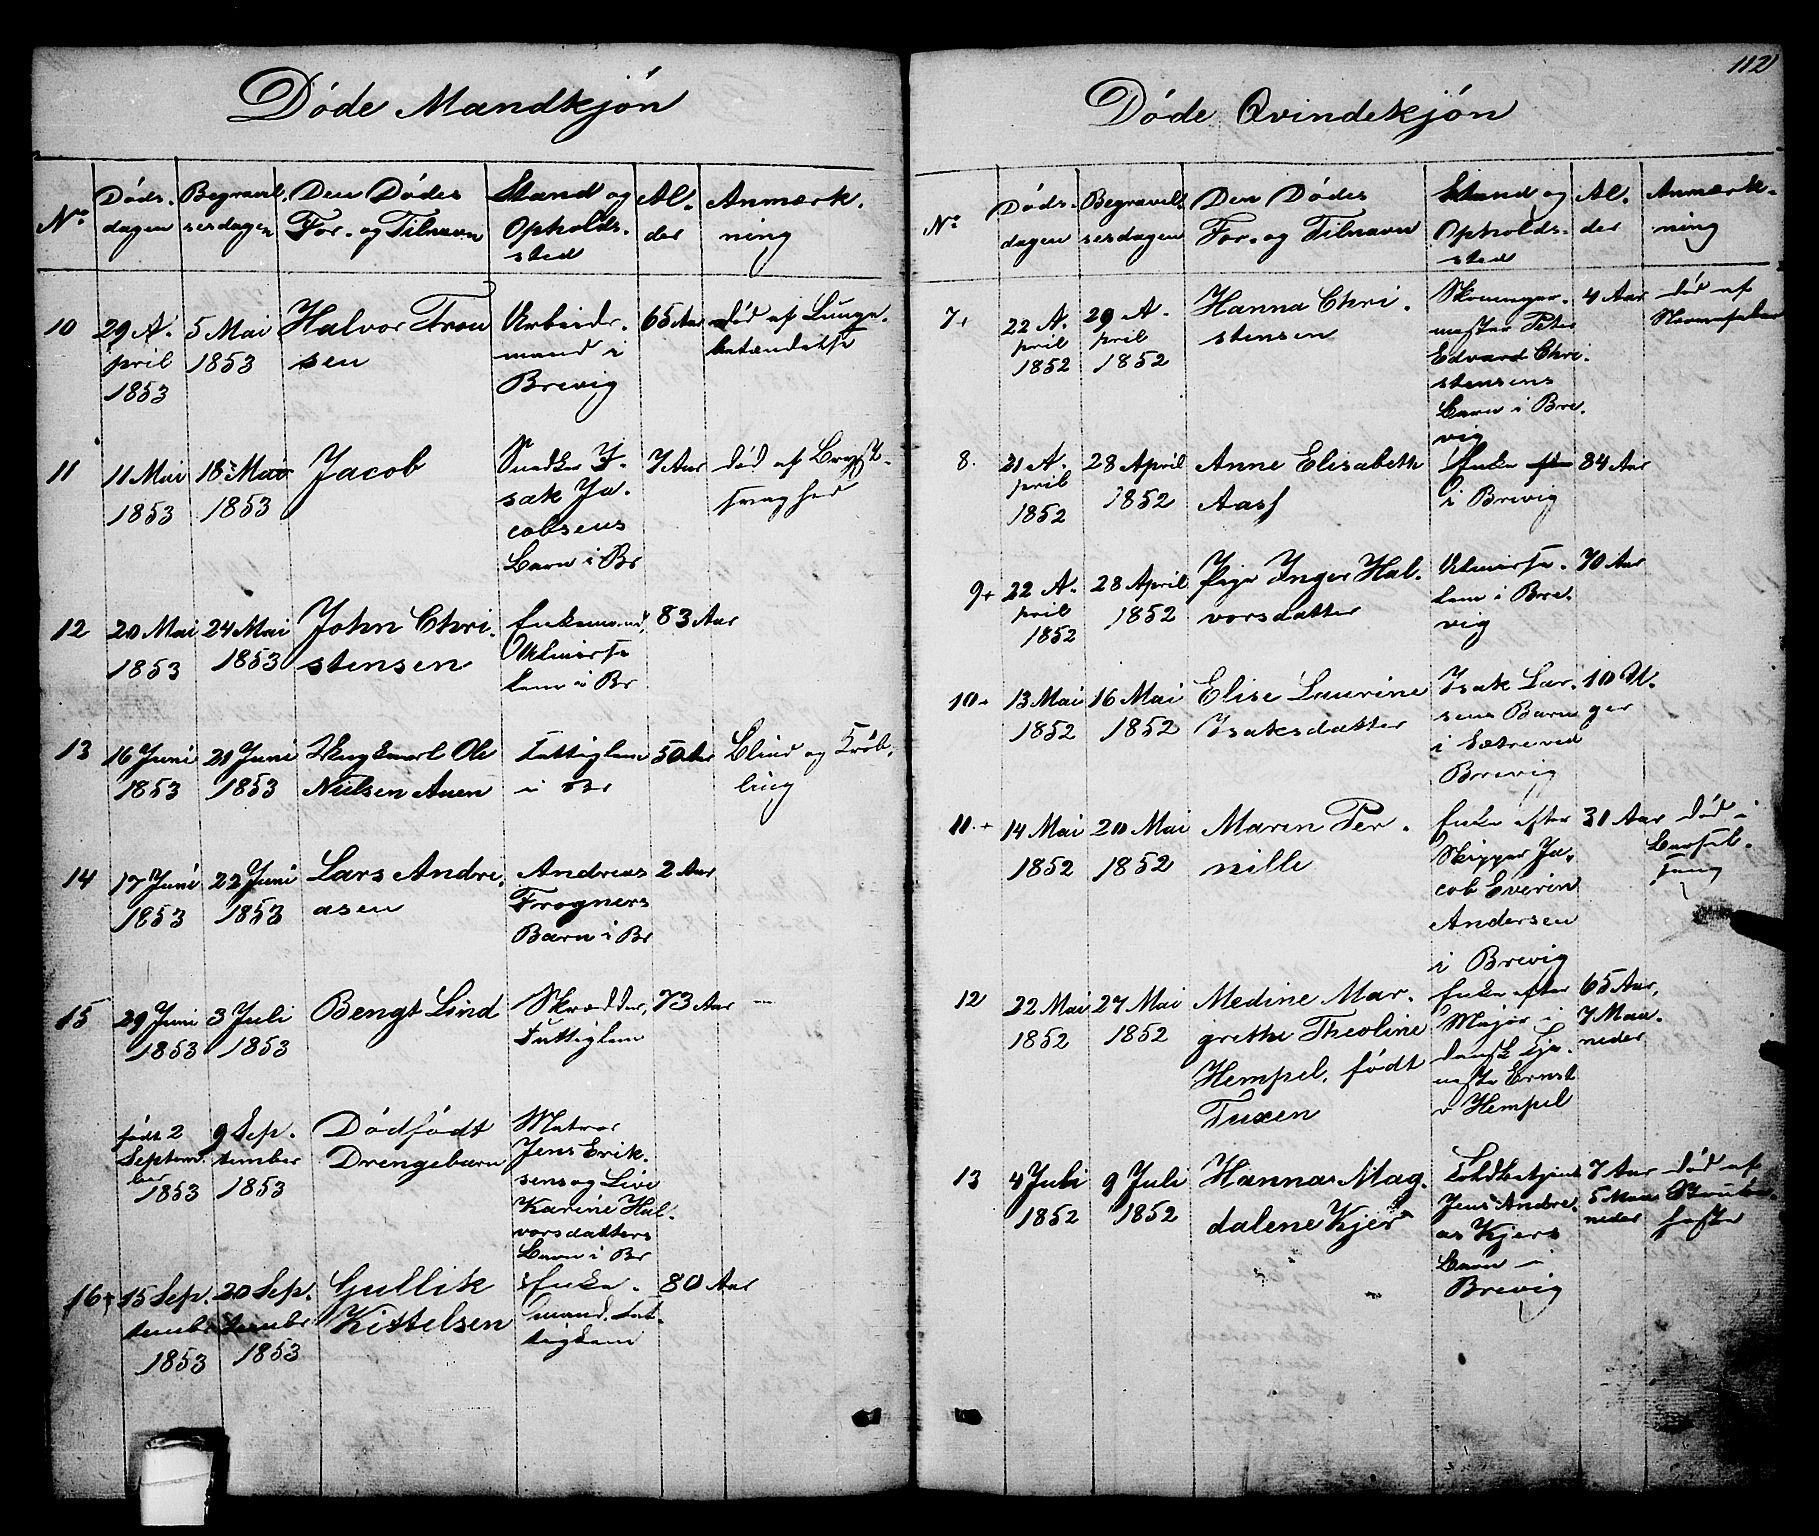 SAKO, Brevik kirkebøker, G/Ga/L0002: Klokkerbok nr. 2, 1846-1865, s. 112